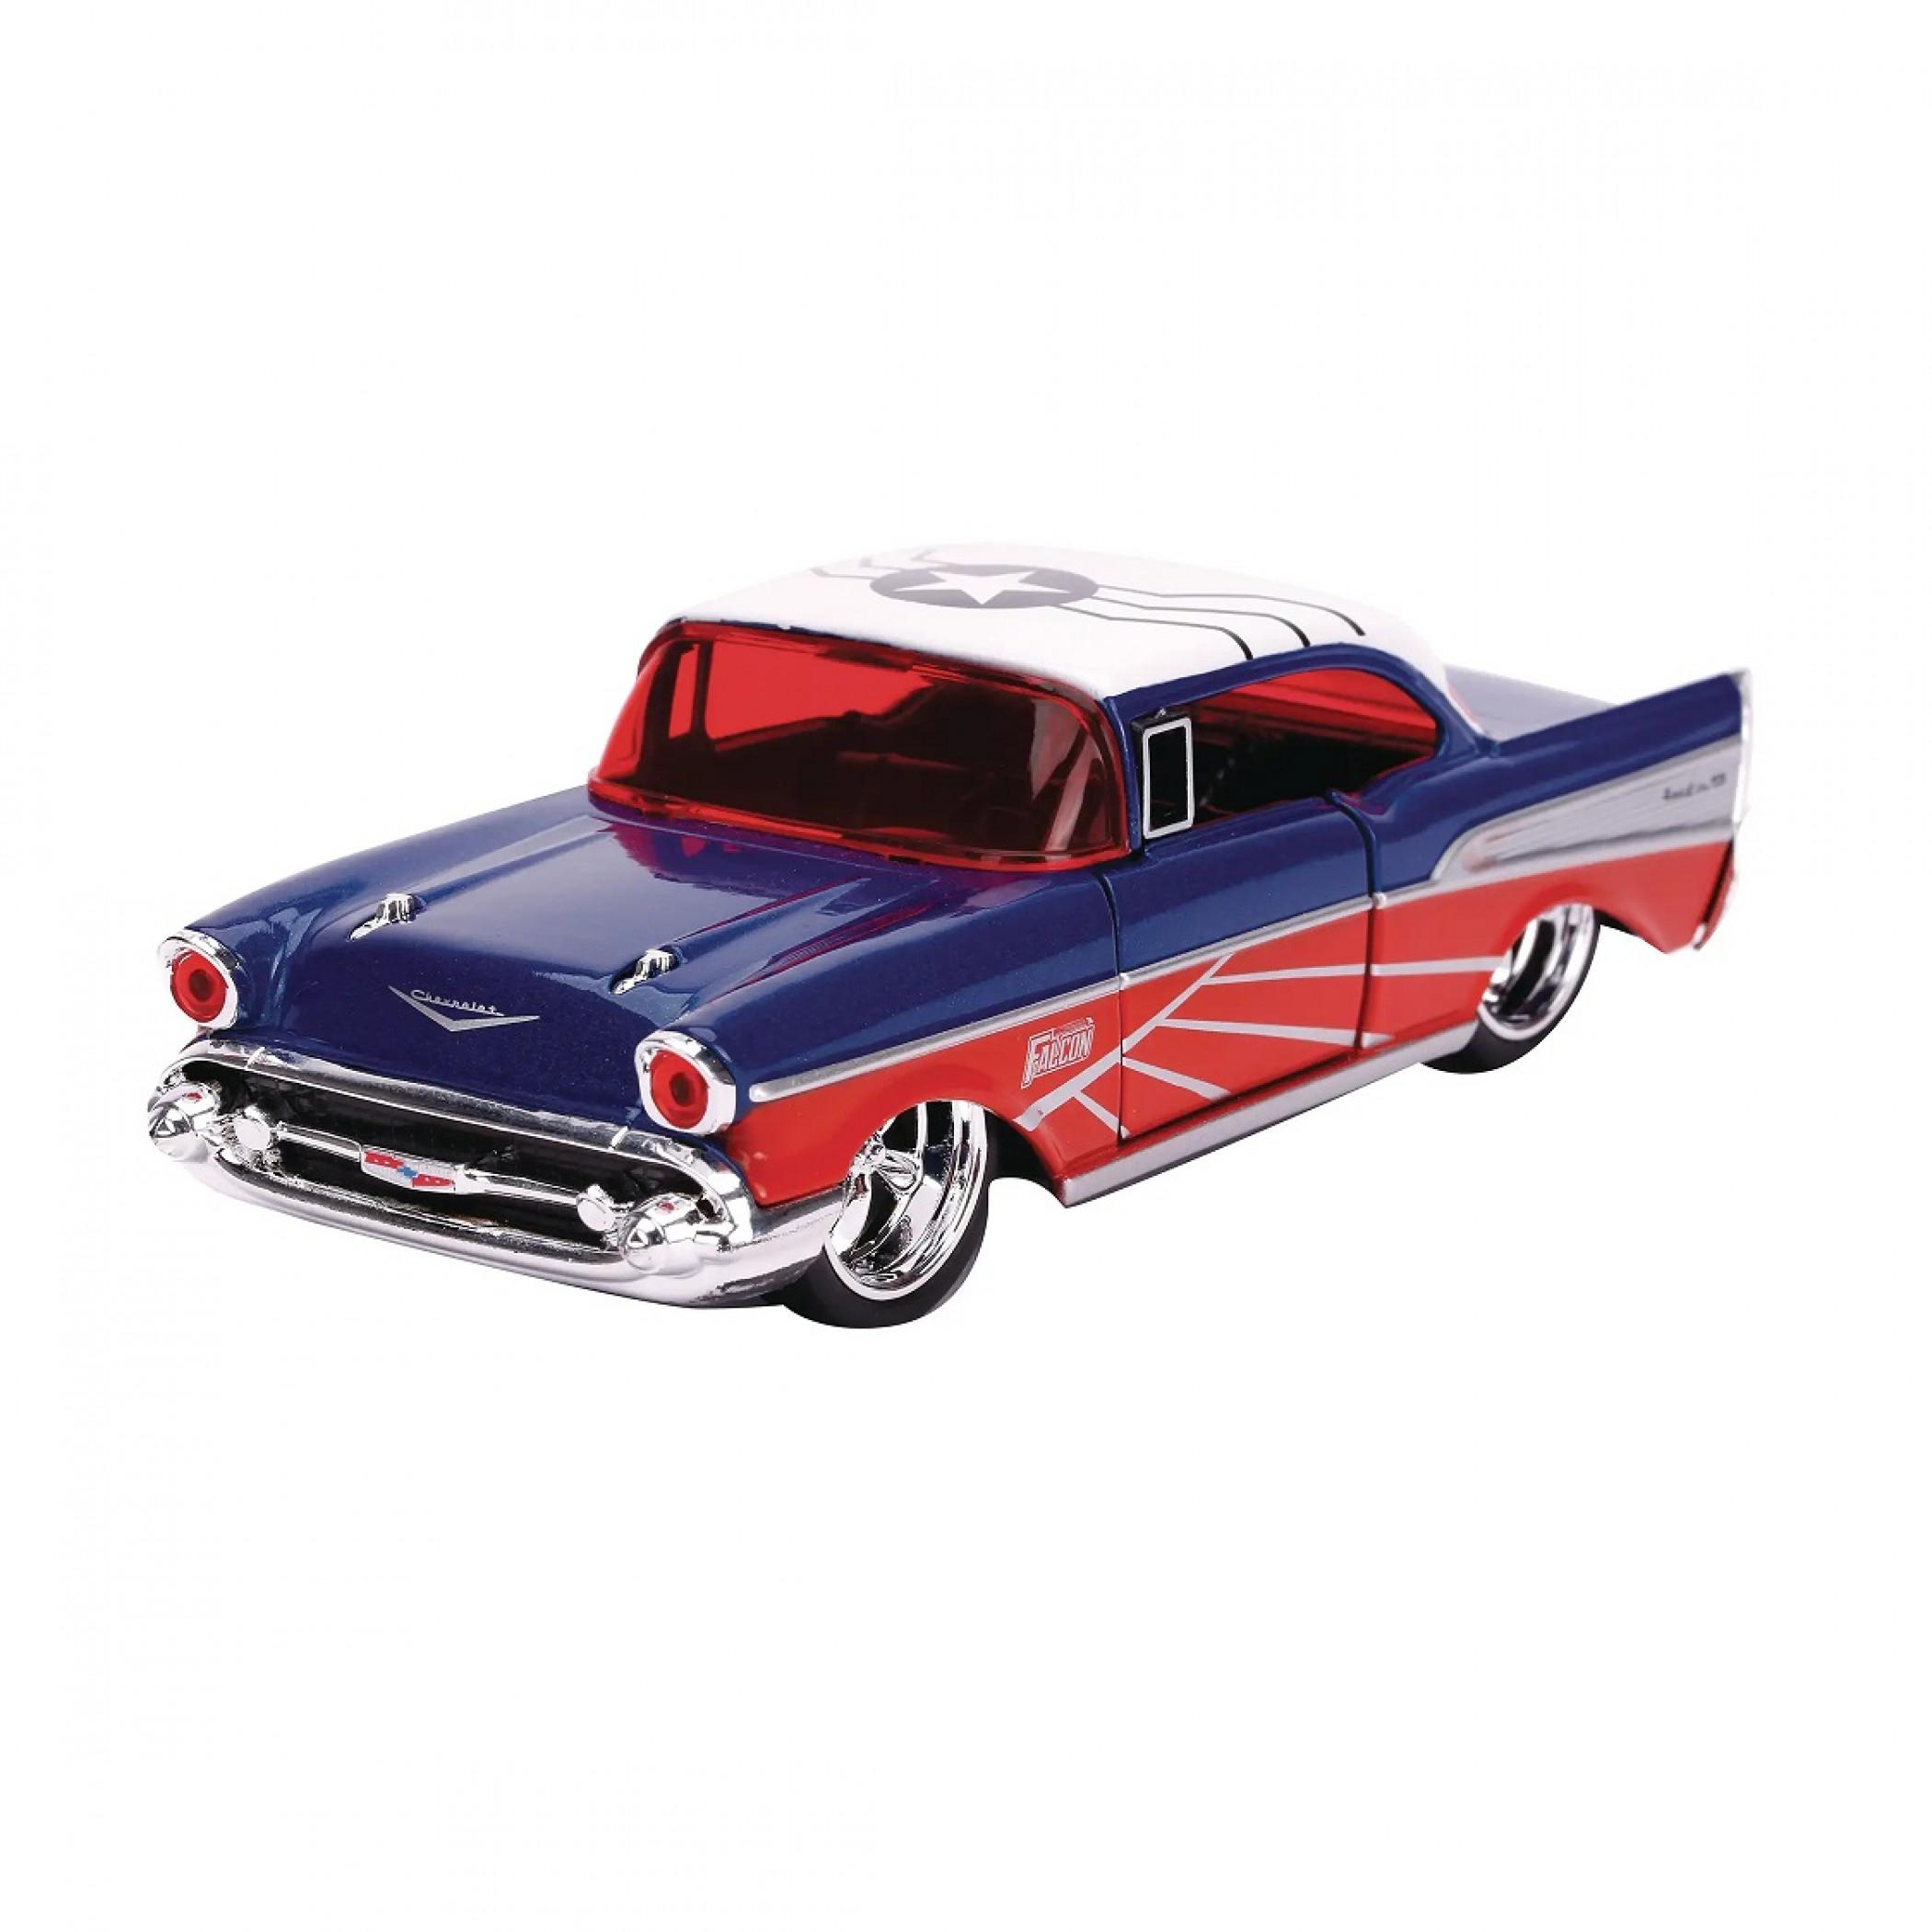 "Falcon 1957 Chevy Bel-Air Diecast Metal 5"" Movie Car by Jada Toys"